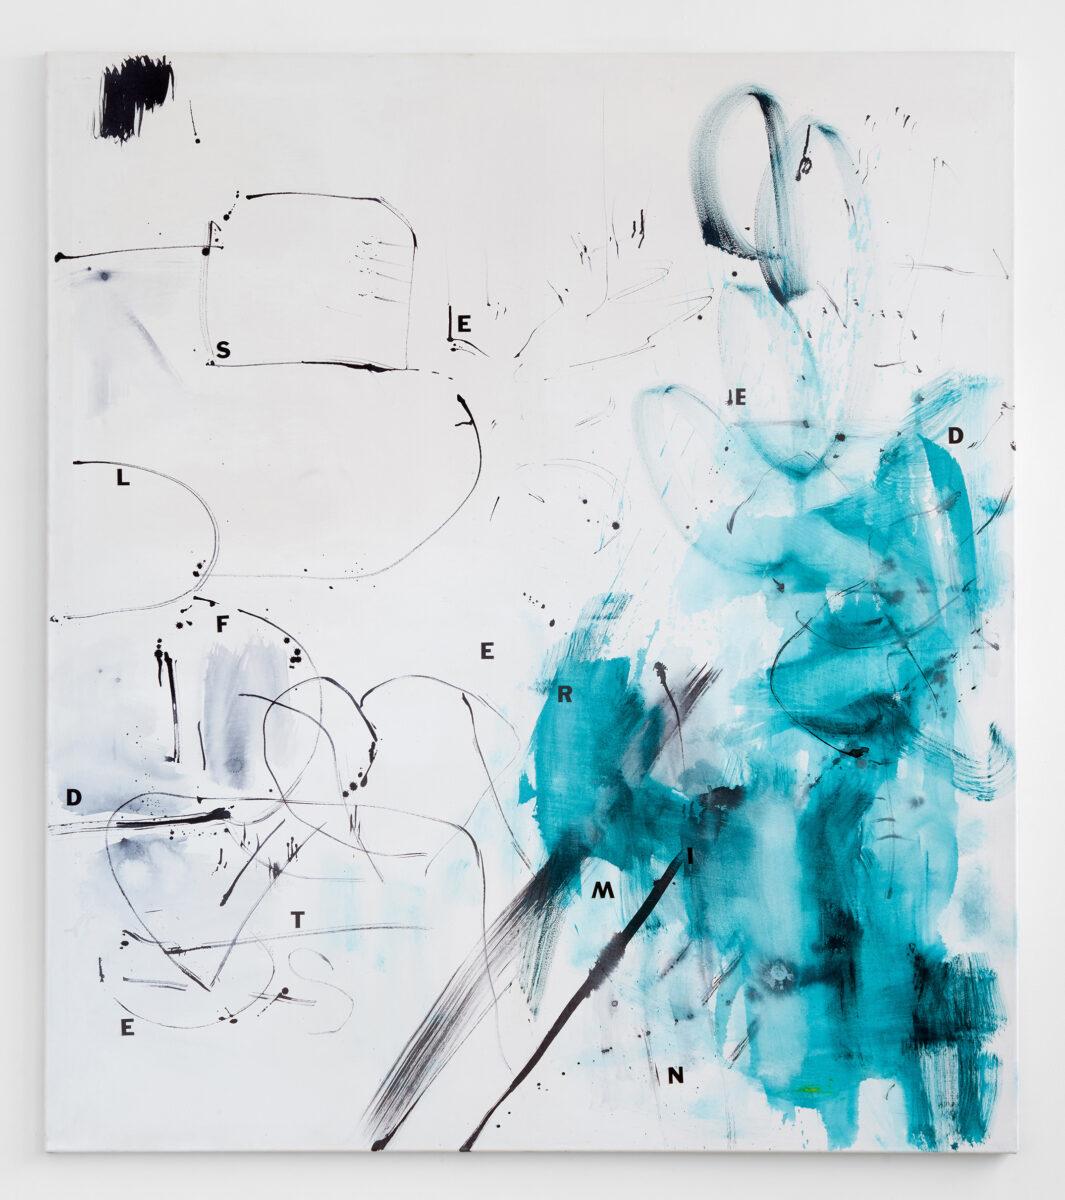 HEIKE-KARIN FÖLL, Self determined, 2016. Gouache, ink and vinyl letters on canvas. Courtesy the artist and Campoli Presti, London, Paris (15.000,-). Artissima 2020